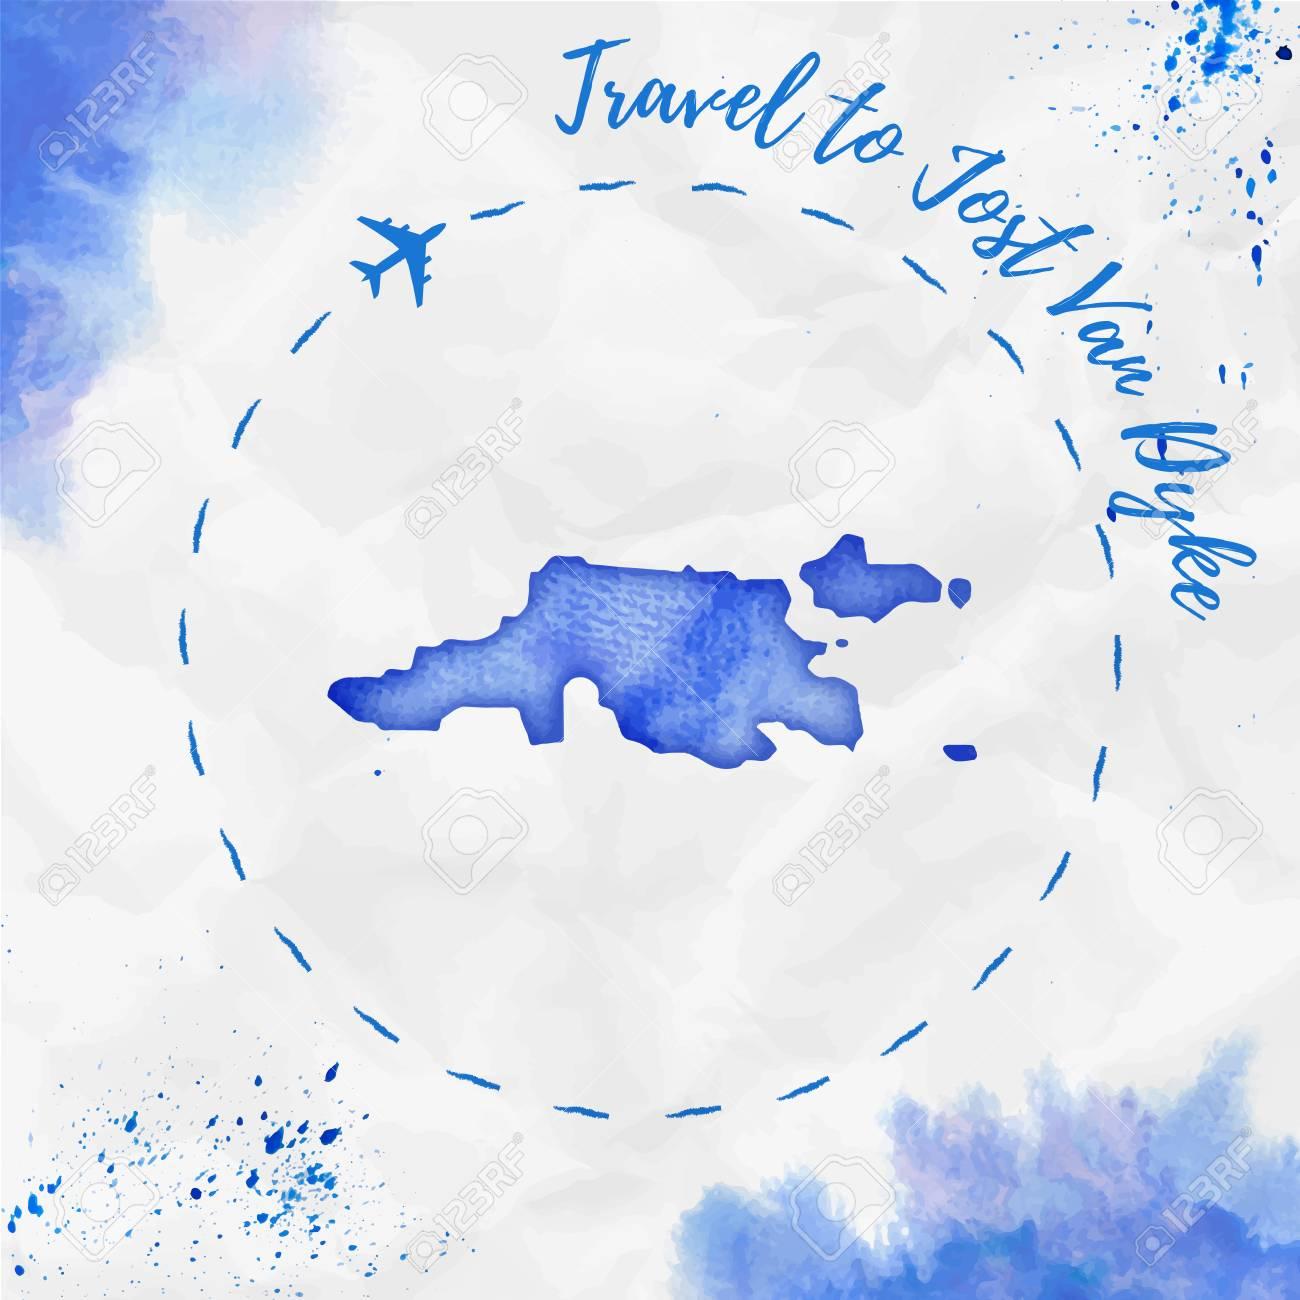 Jost Van Dyke Watercolor Island Map In Blue Colors Travel To